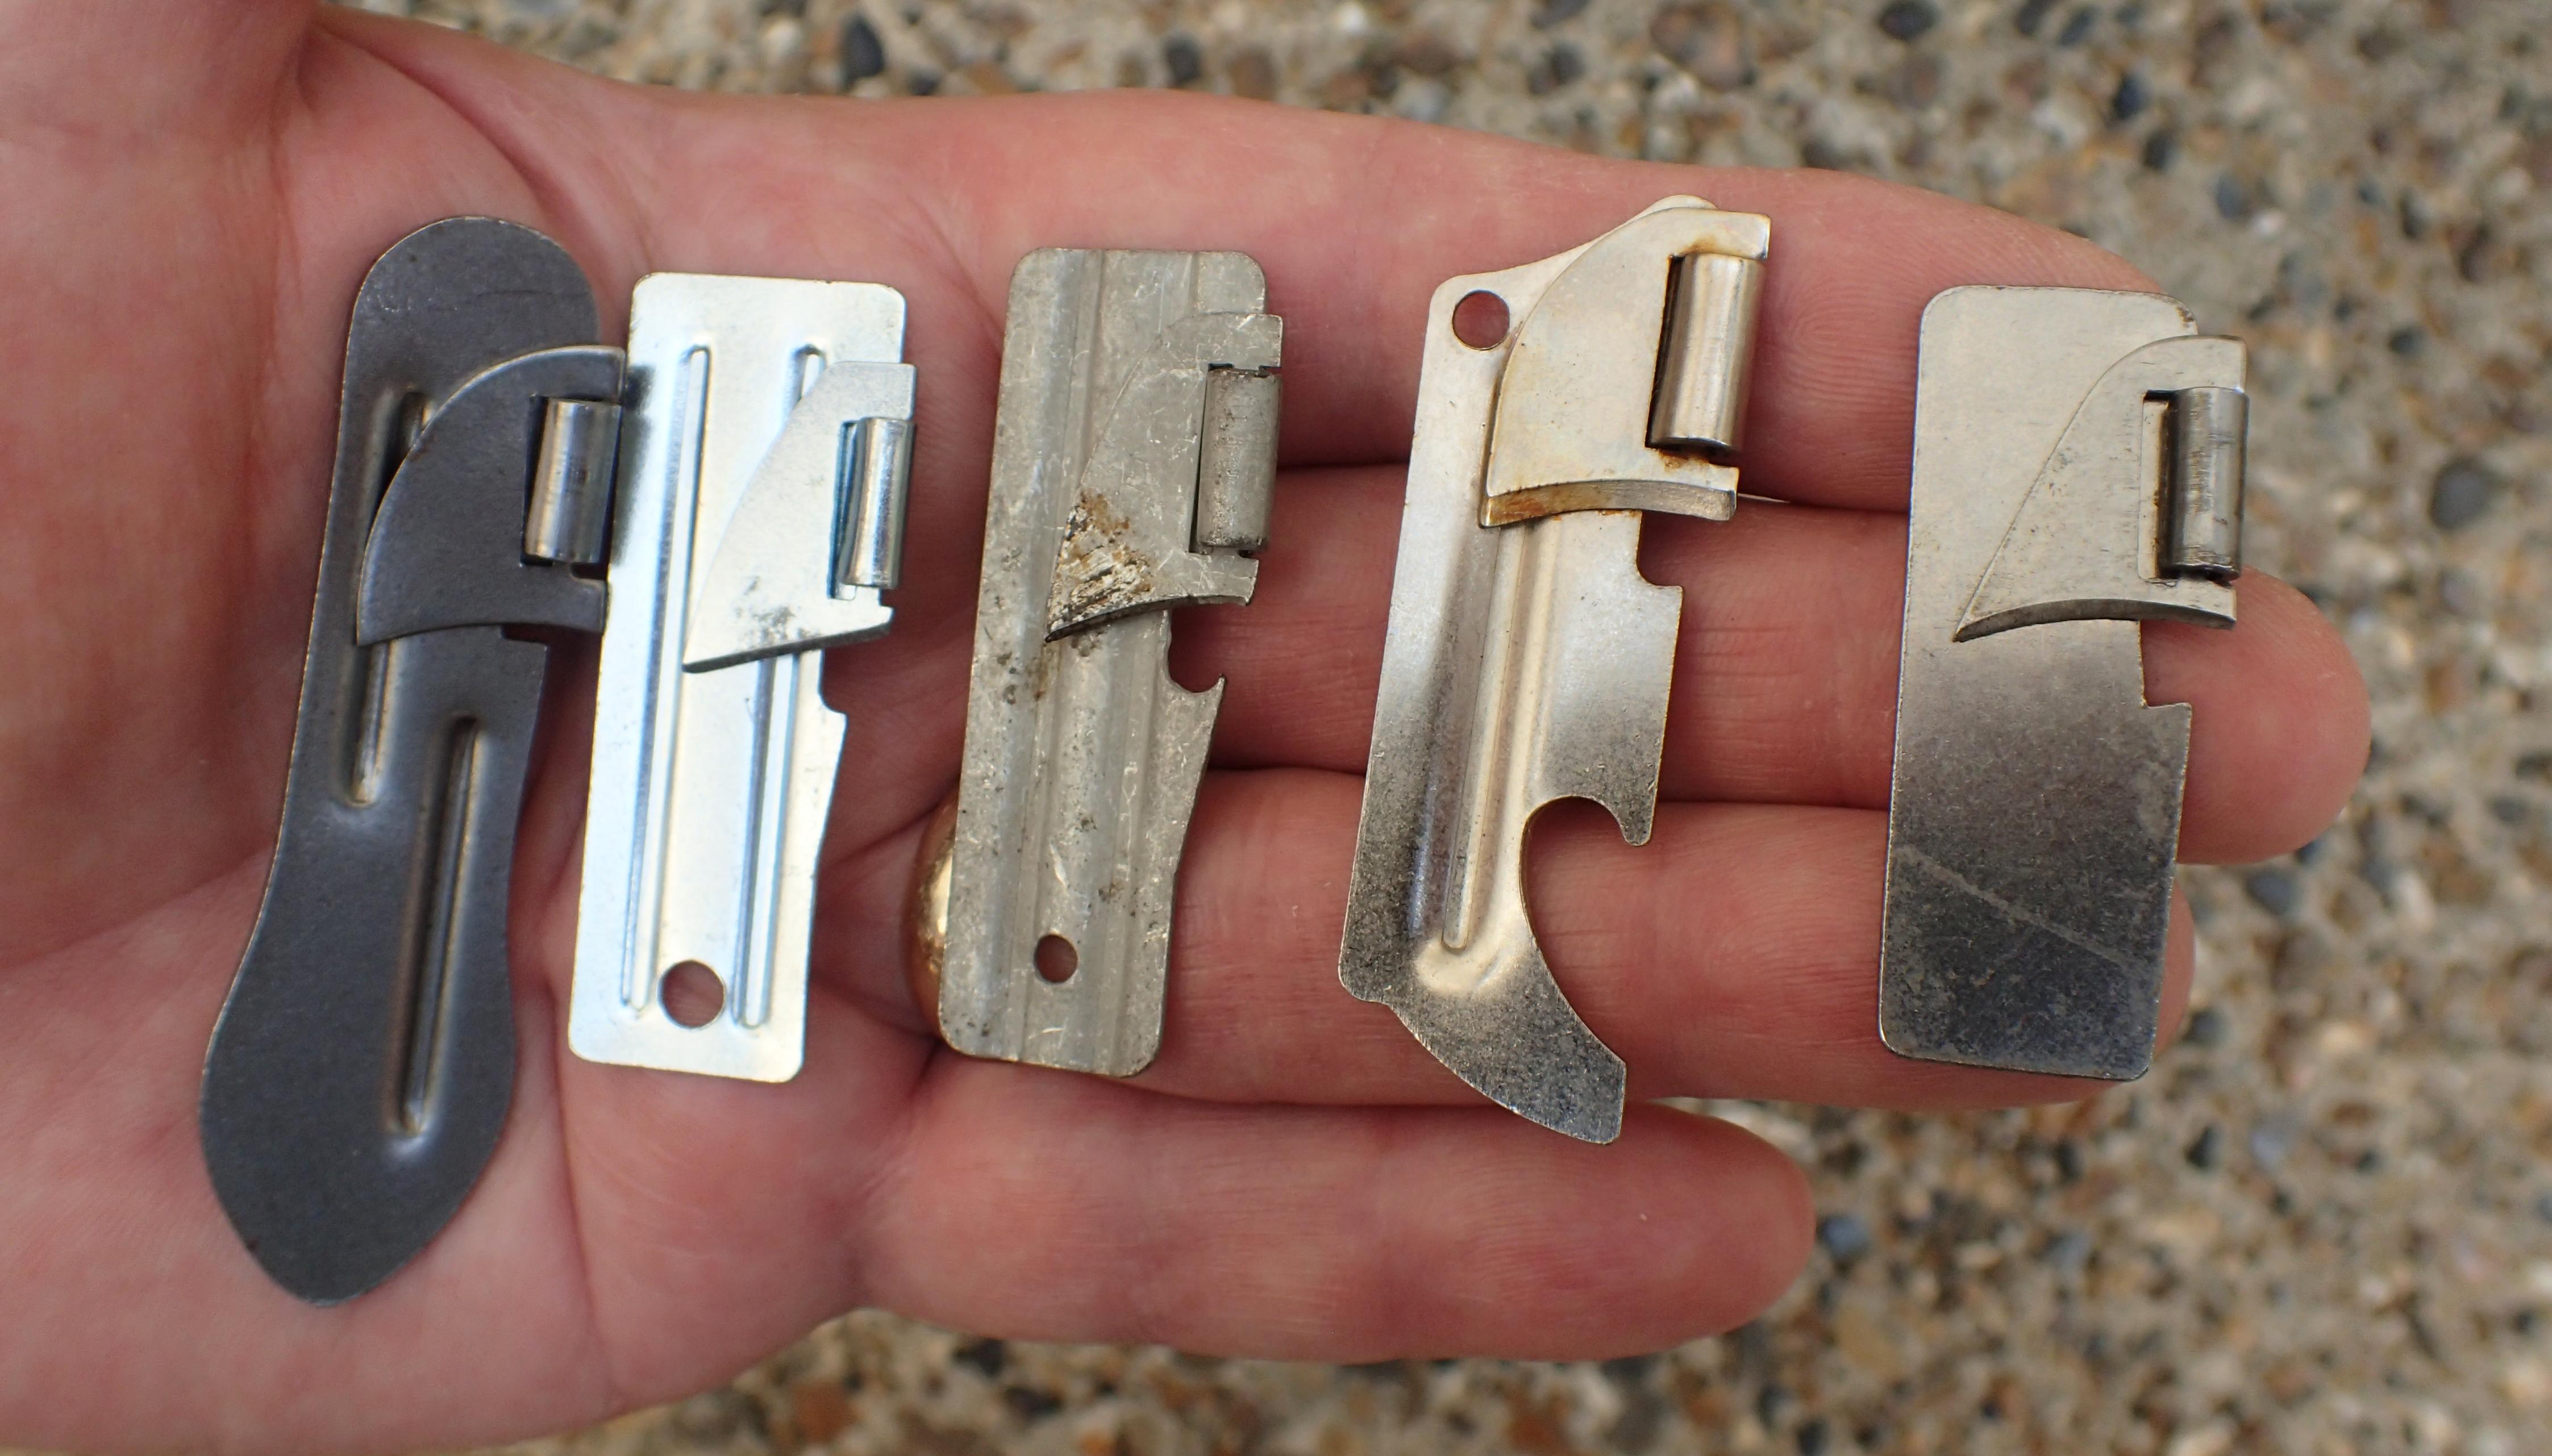 Medium sized openers